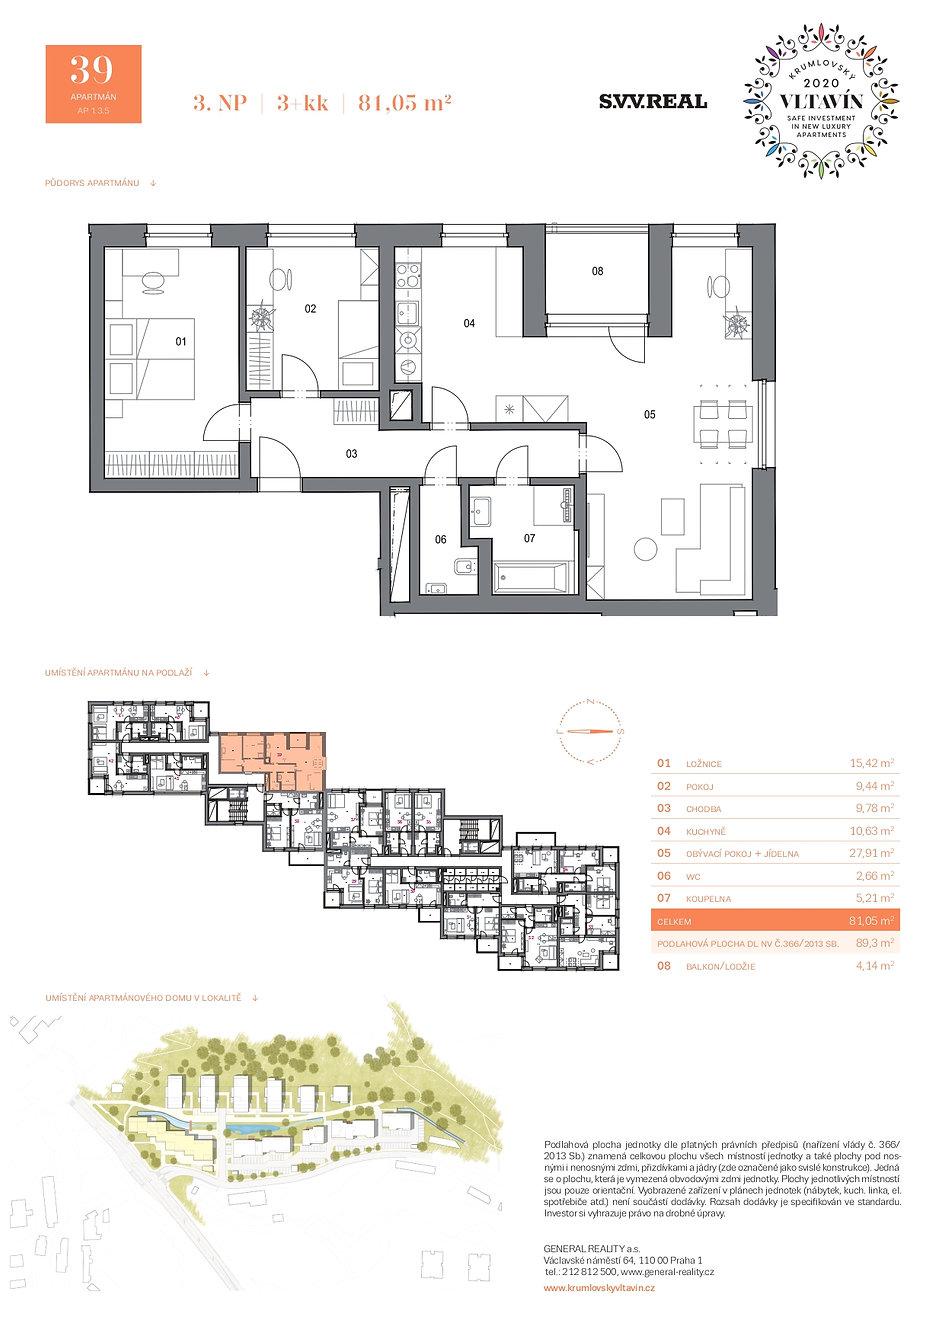 GR_krumlovsky-vltavin_bytove-karty-apartmany_3NP_A39_page-0001.jpg